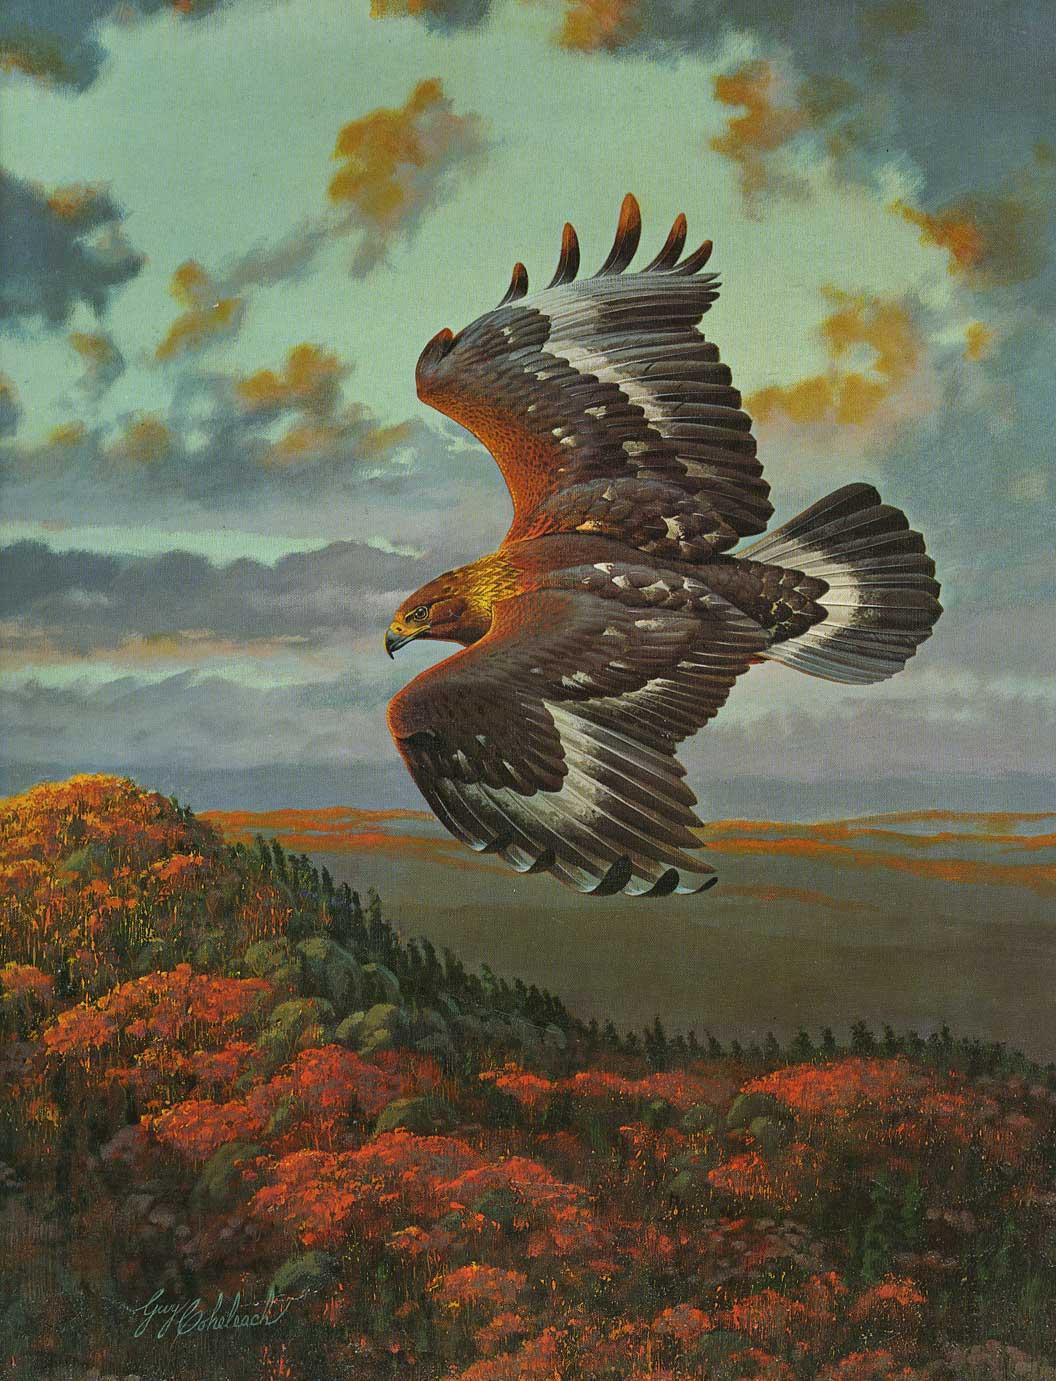 """Golden Eagle/Hawk Mountain""  -  40"" x 30"" ""Golden Eagle"" - Hawk Mountain  Birds of Prey  Raptors"